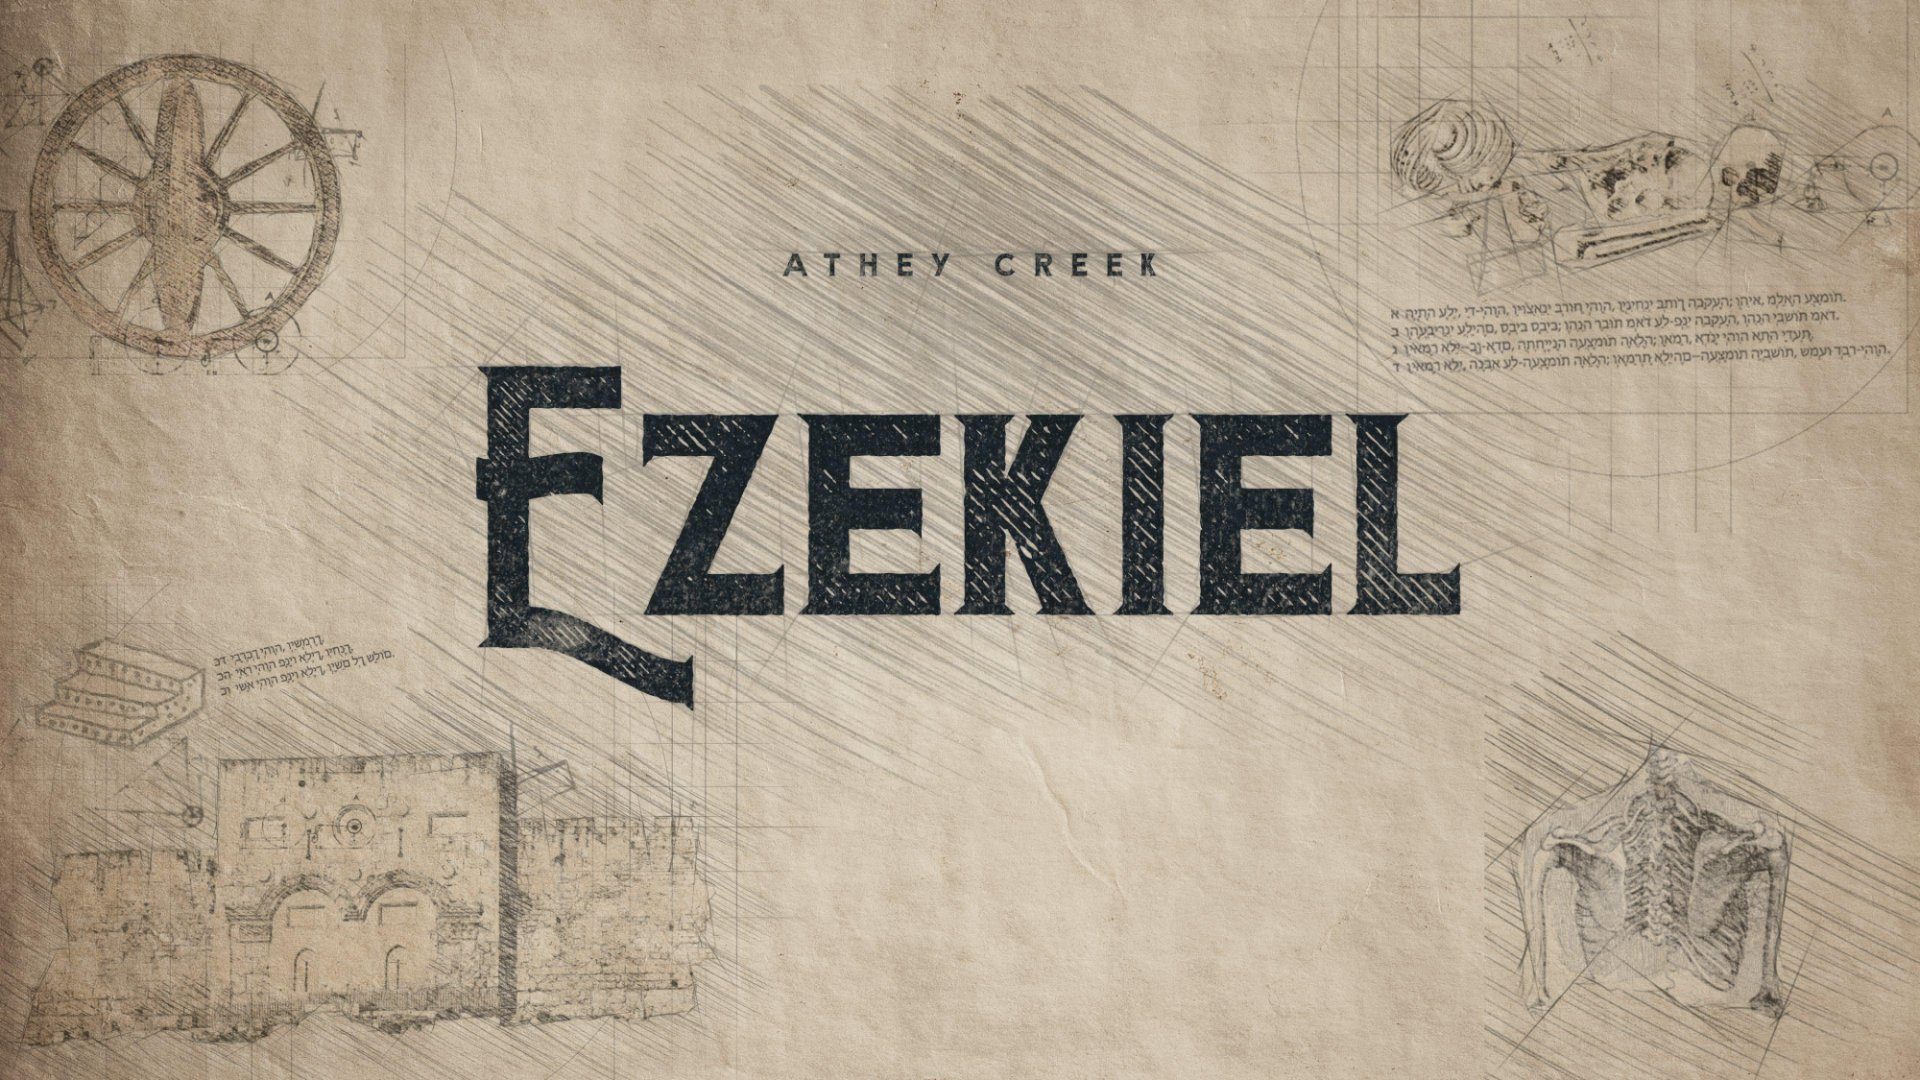 Teaching artwork for Ezekiel